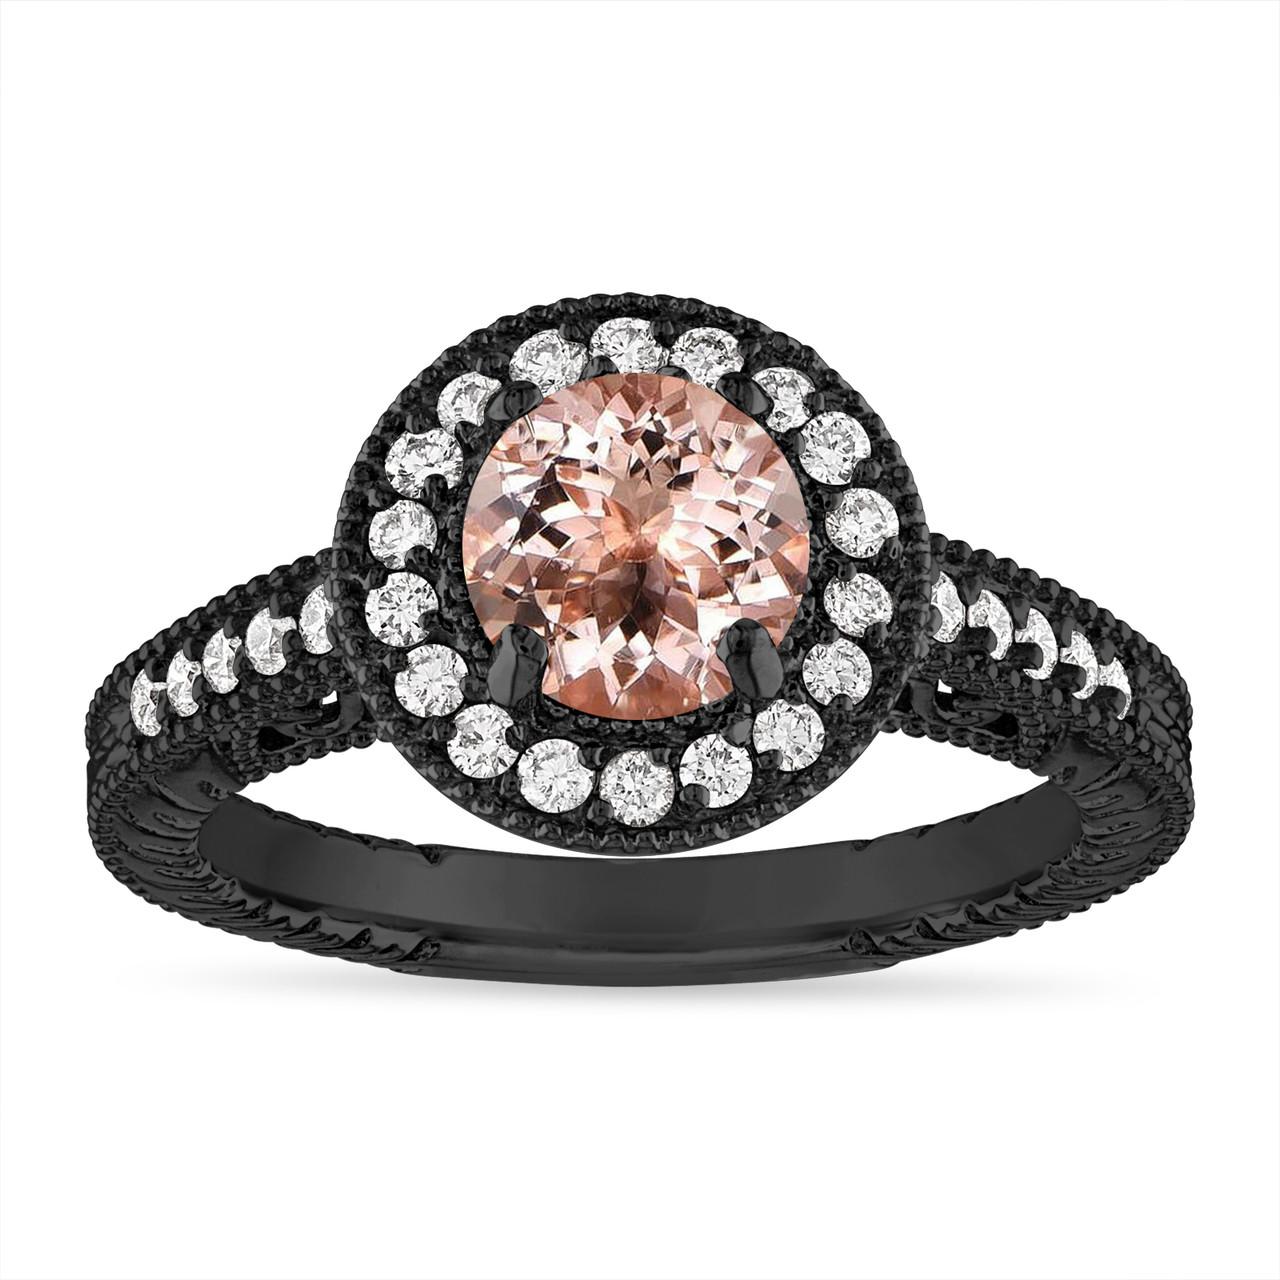 ab9f451ce290e Morganite and Diamond Engagement Ring 1.14 Carat Vintage Halo 14K Black  Gold Handmade Unique